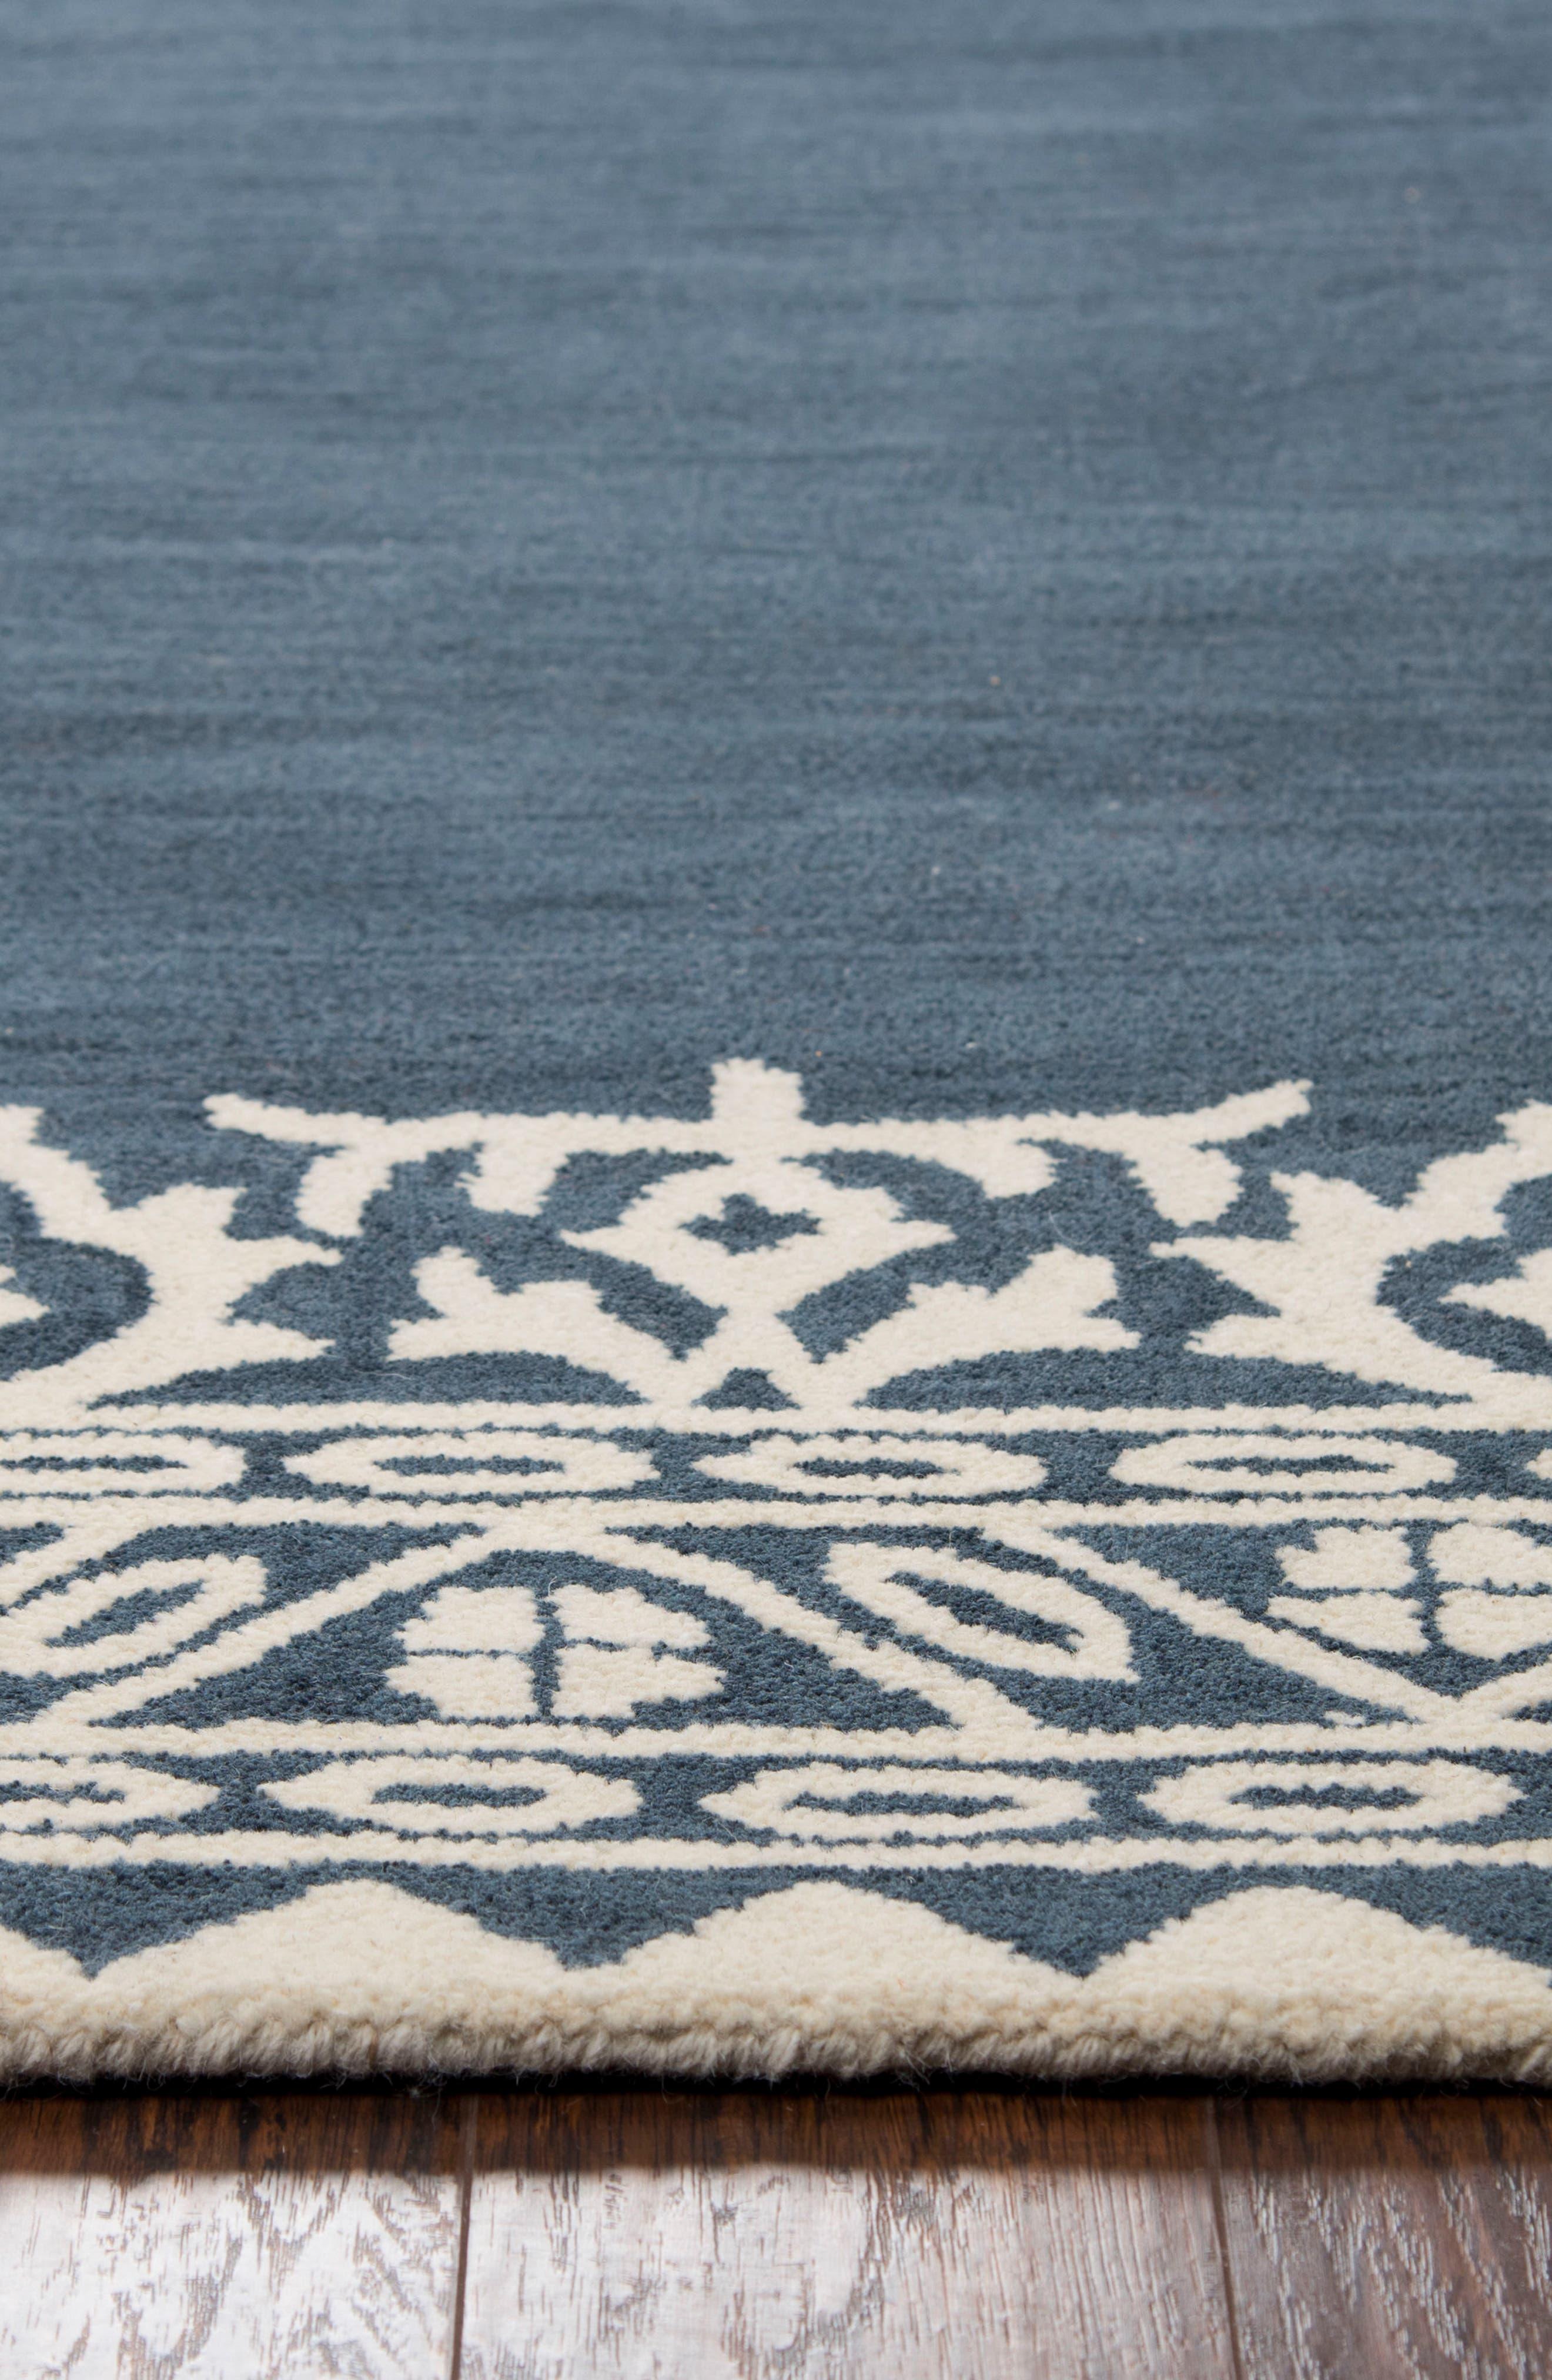 Framed Medallion Hand Tufted Wool Area Rug,                             Alternate thumbnail 4, color,                             400